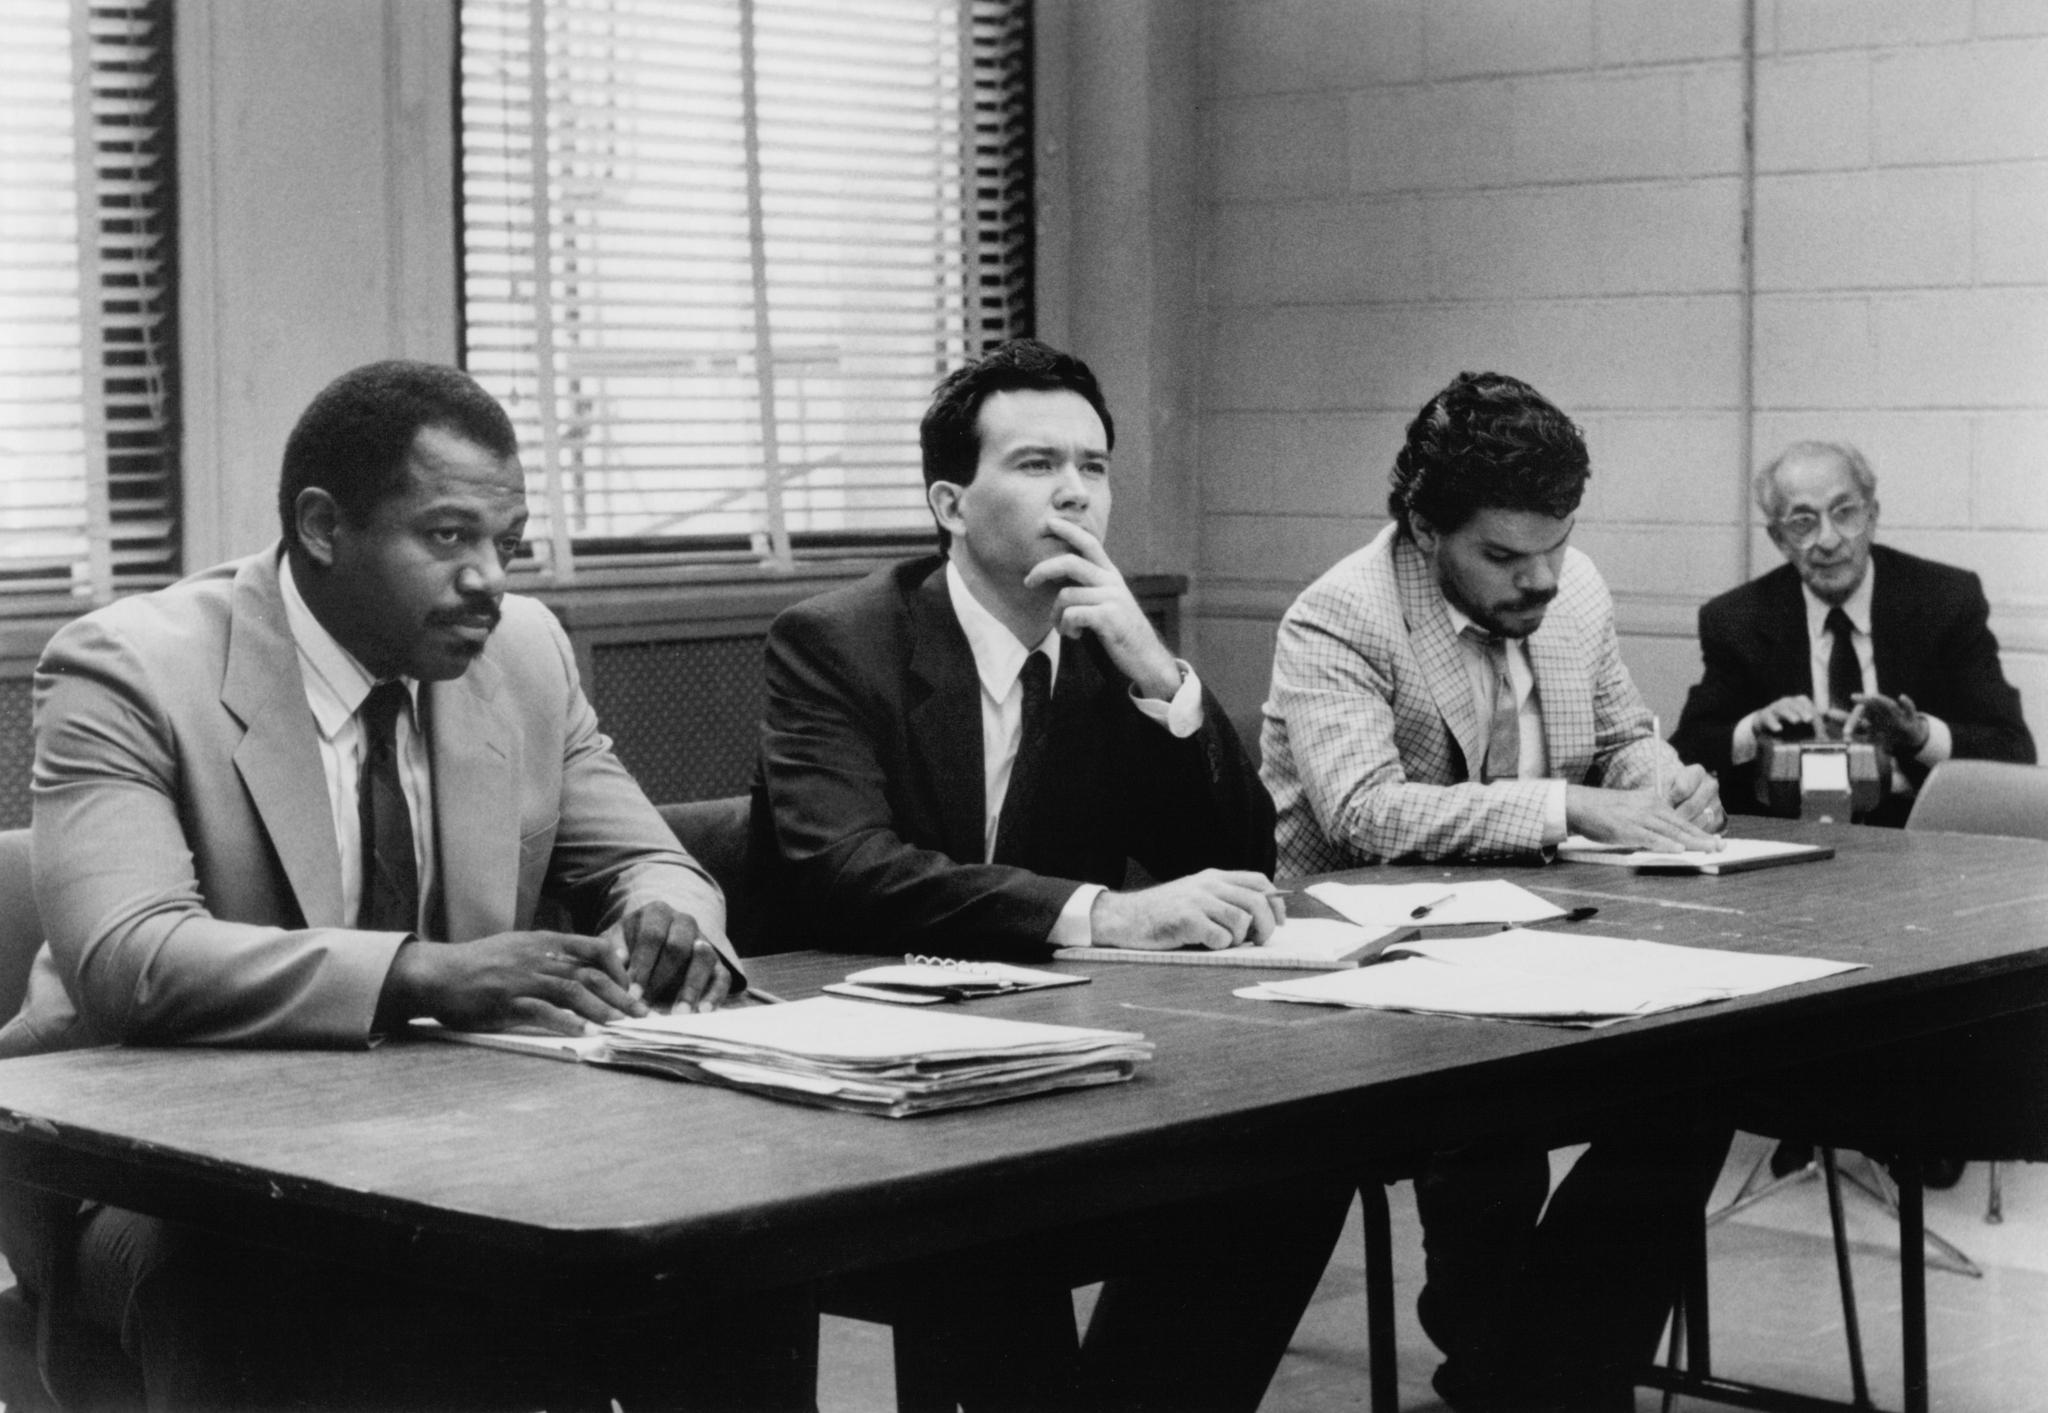 Timothy Hutton, Charles S. Dutton, and Luis Guzmán in Q & A (1990)